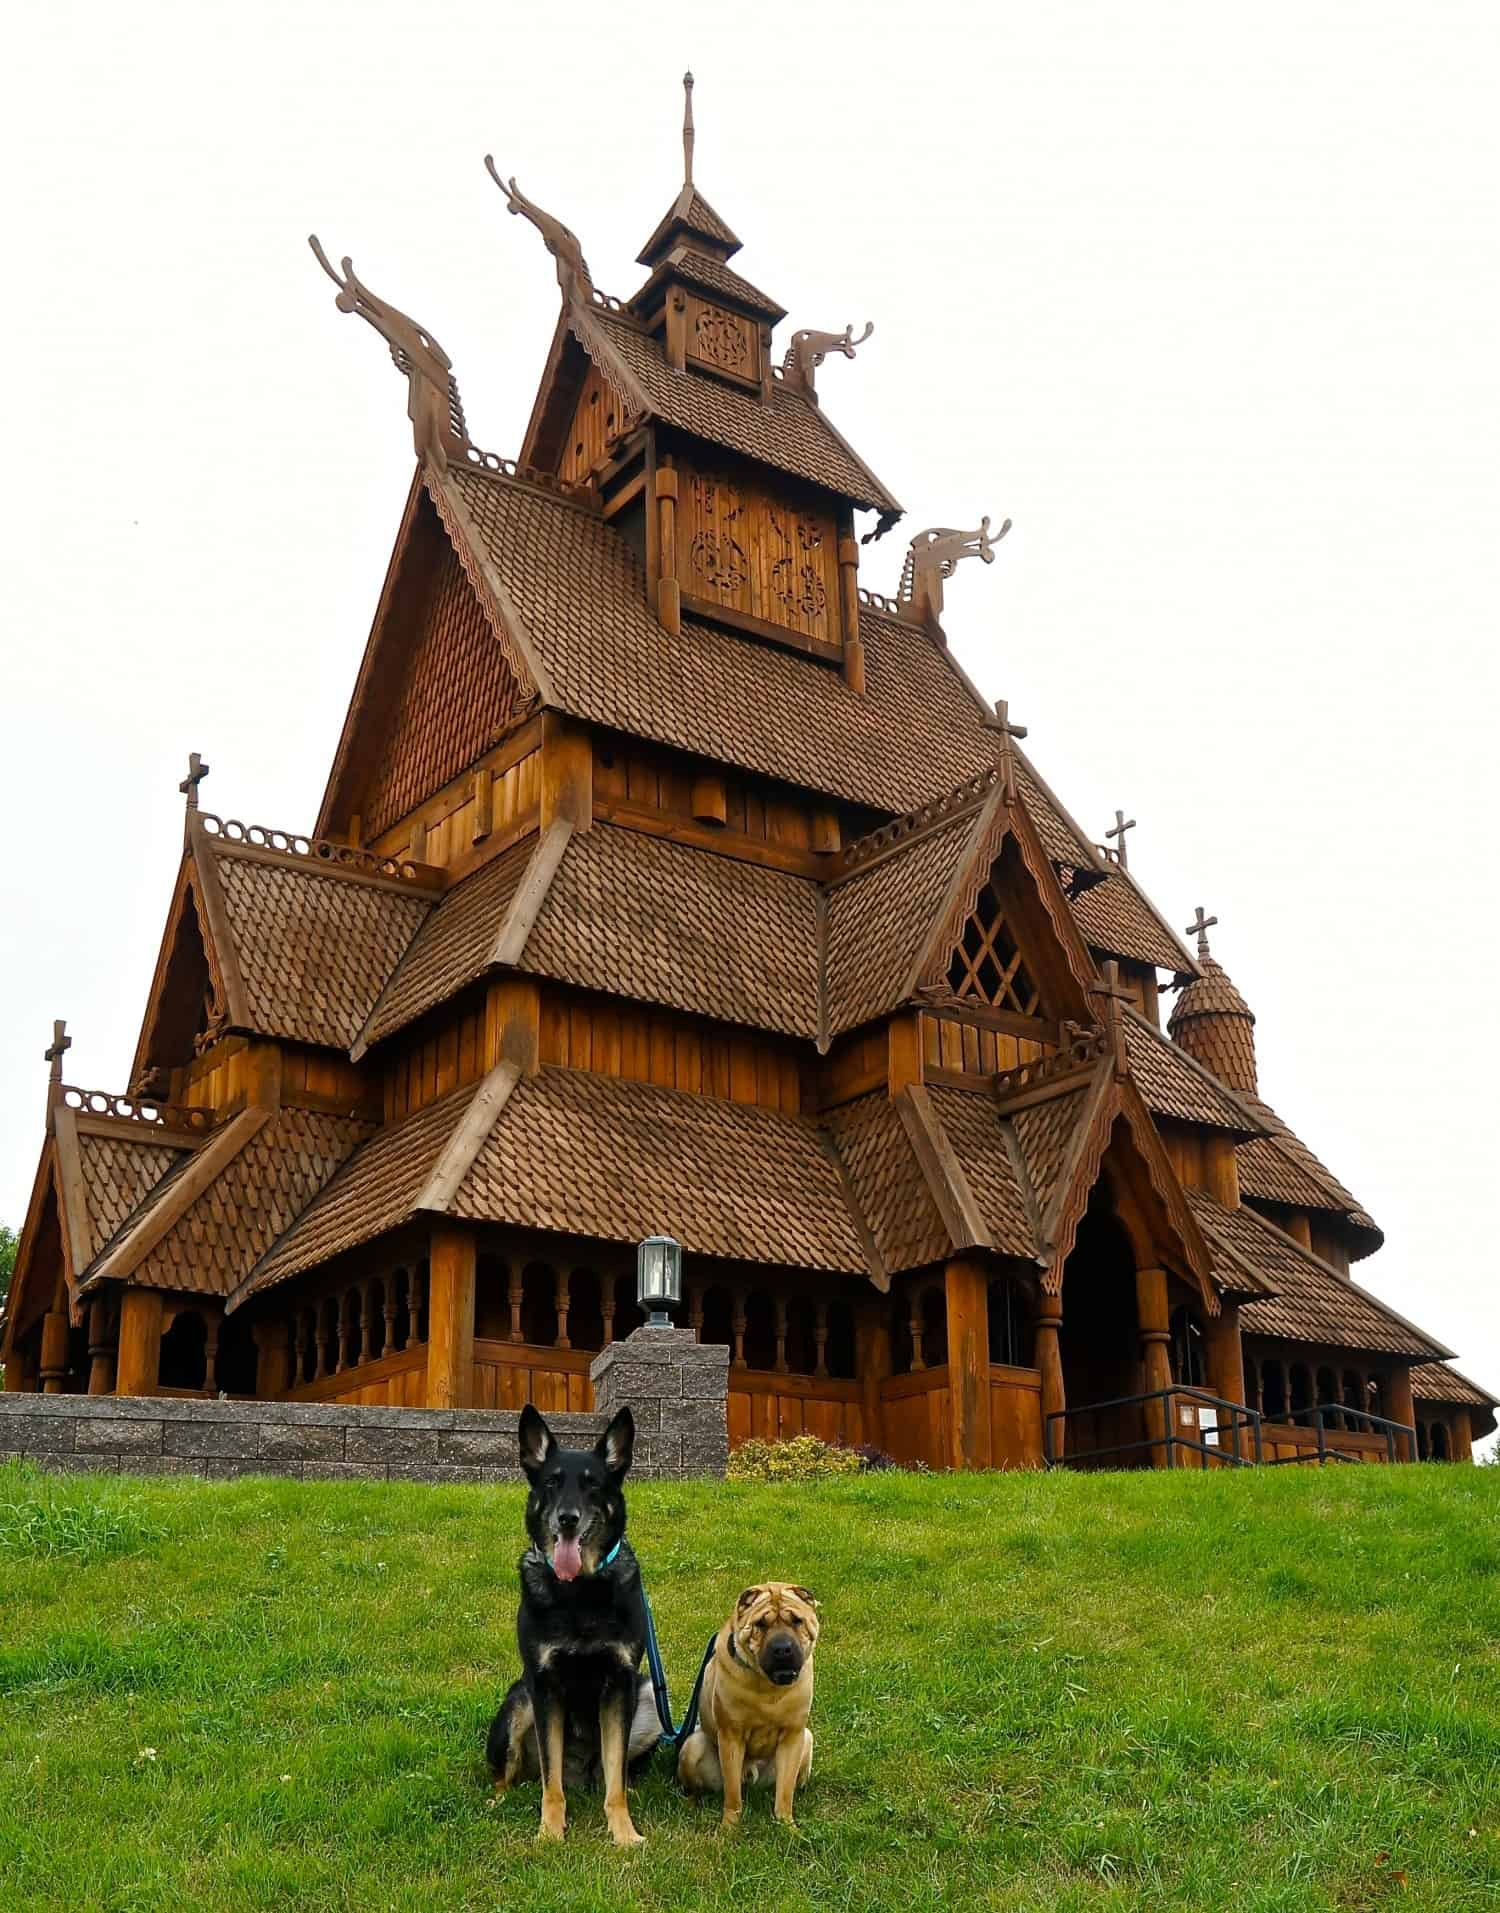 Scandinavian Heritage Center - Minot, ND